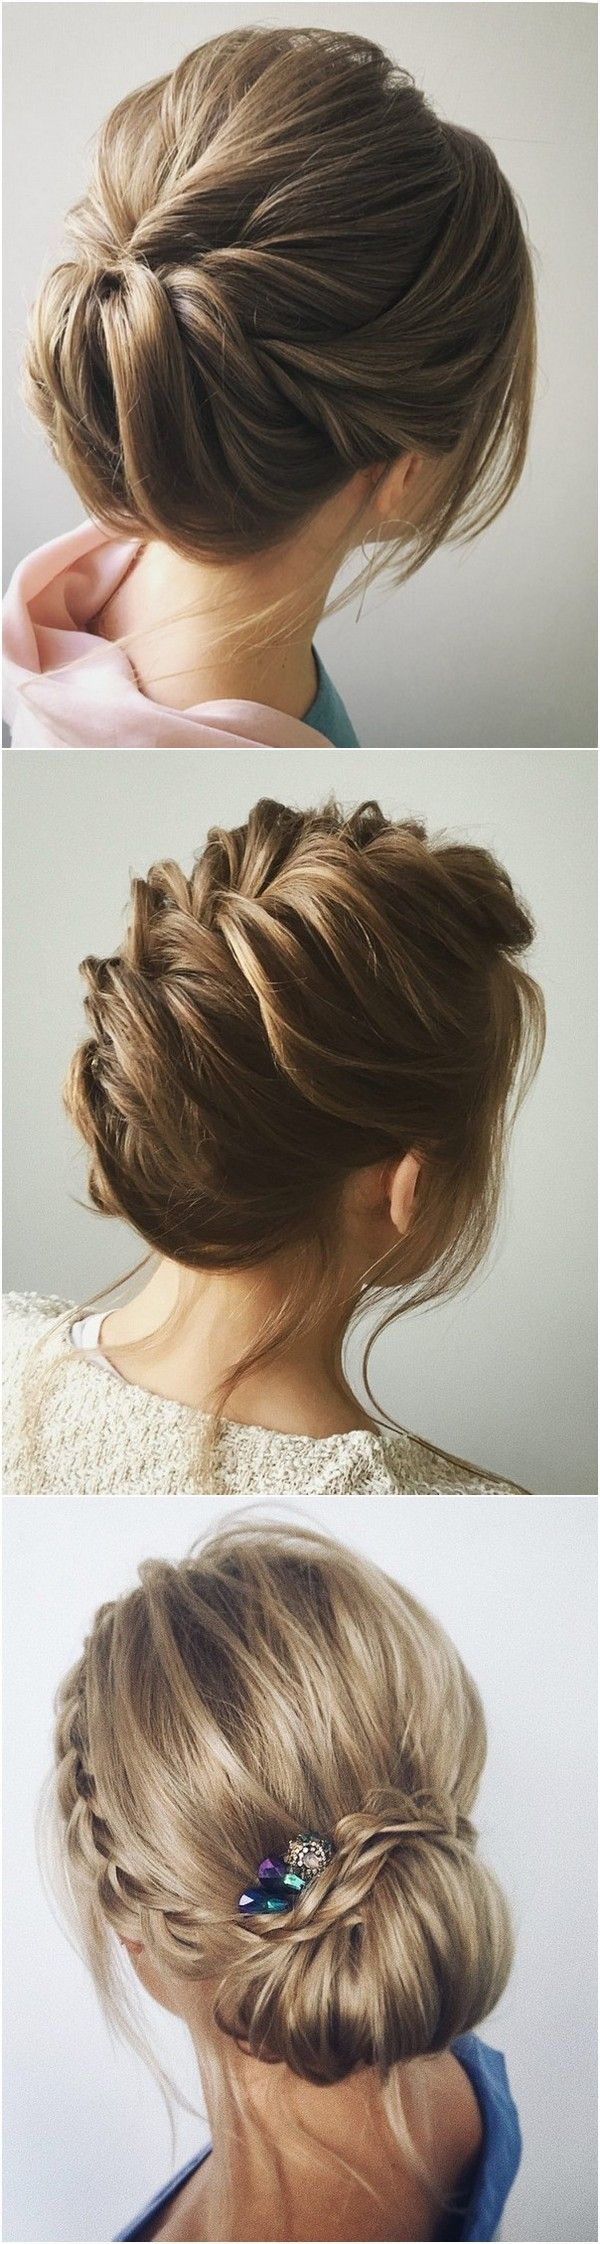 romantic twisted updo wedding hairstyle http://niffler-elm.tumblr